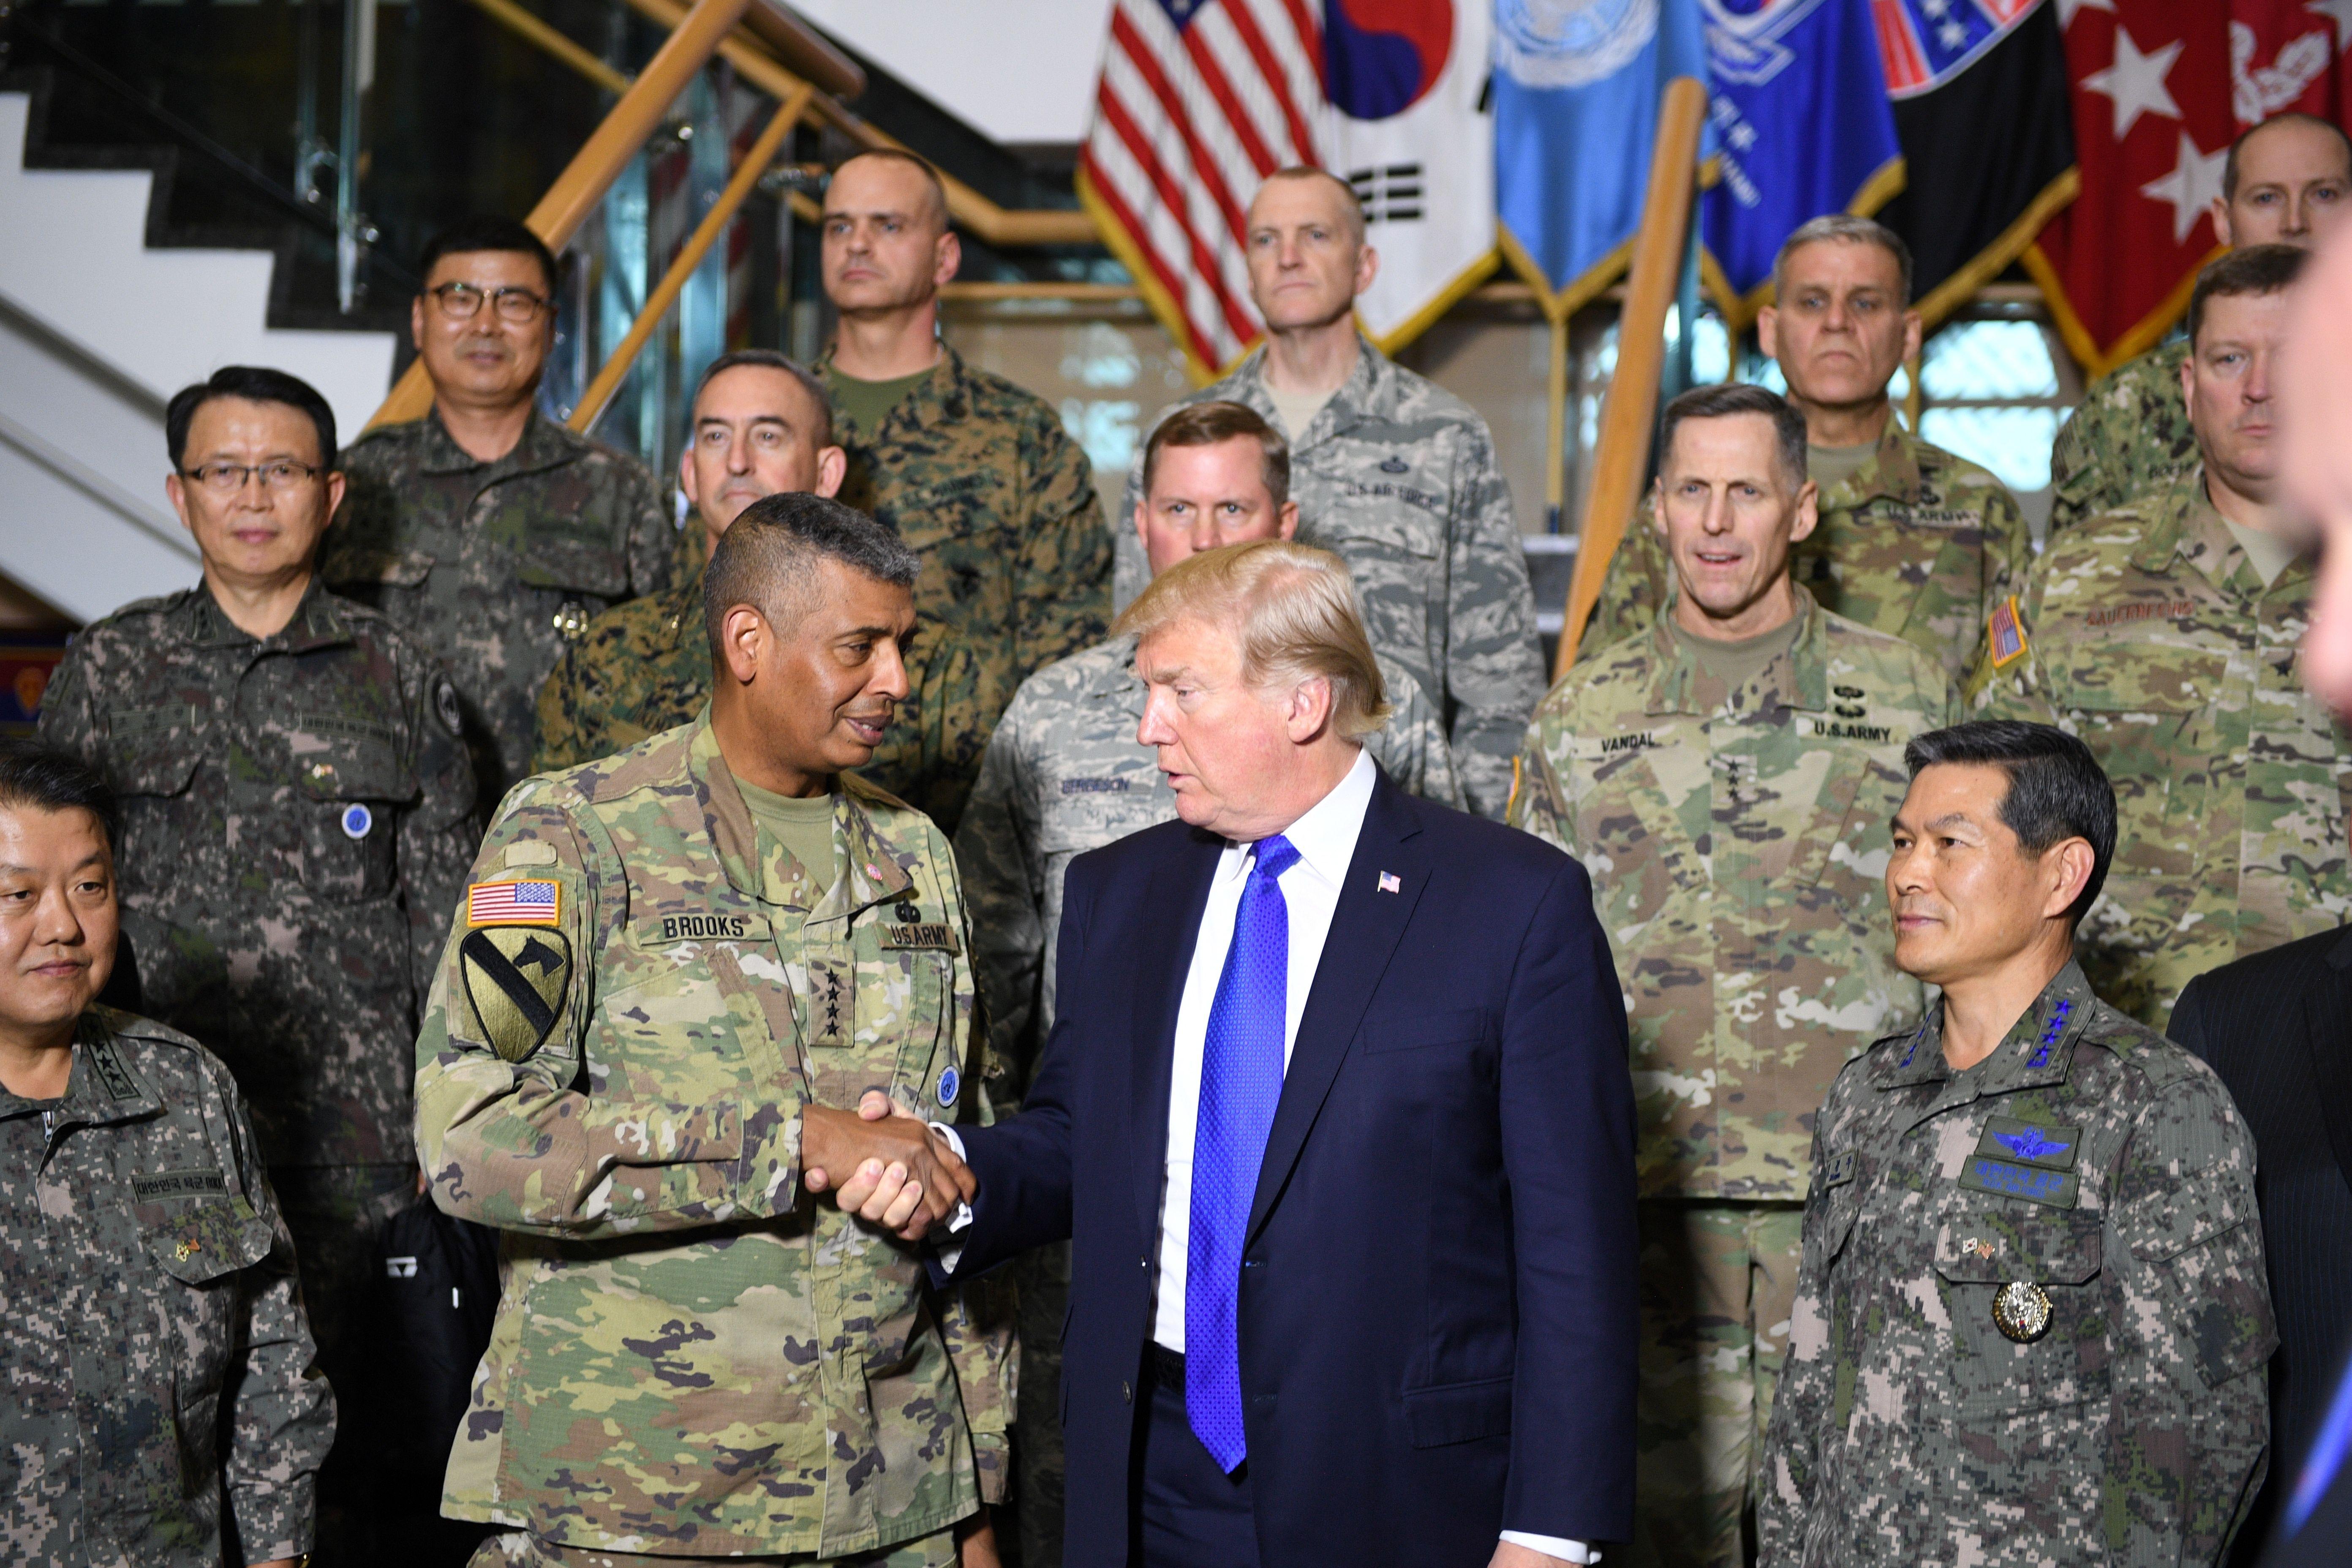 Trump Peddles His Private Golf Club During South Korea Speech